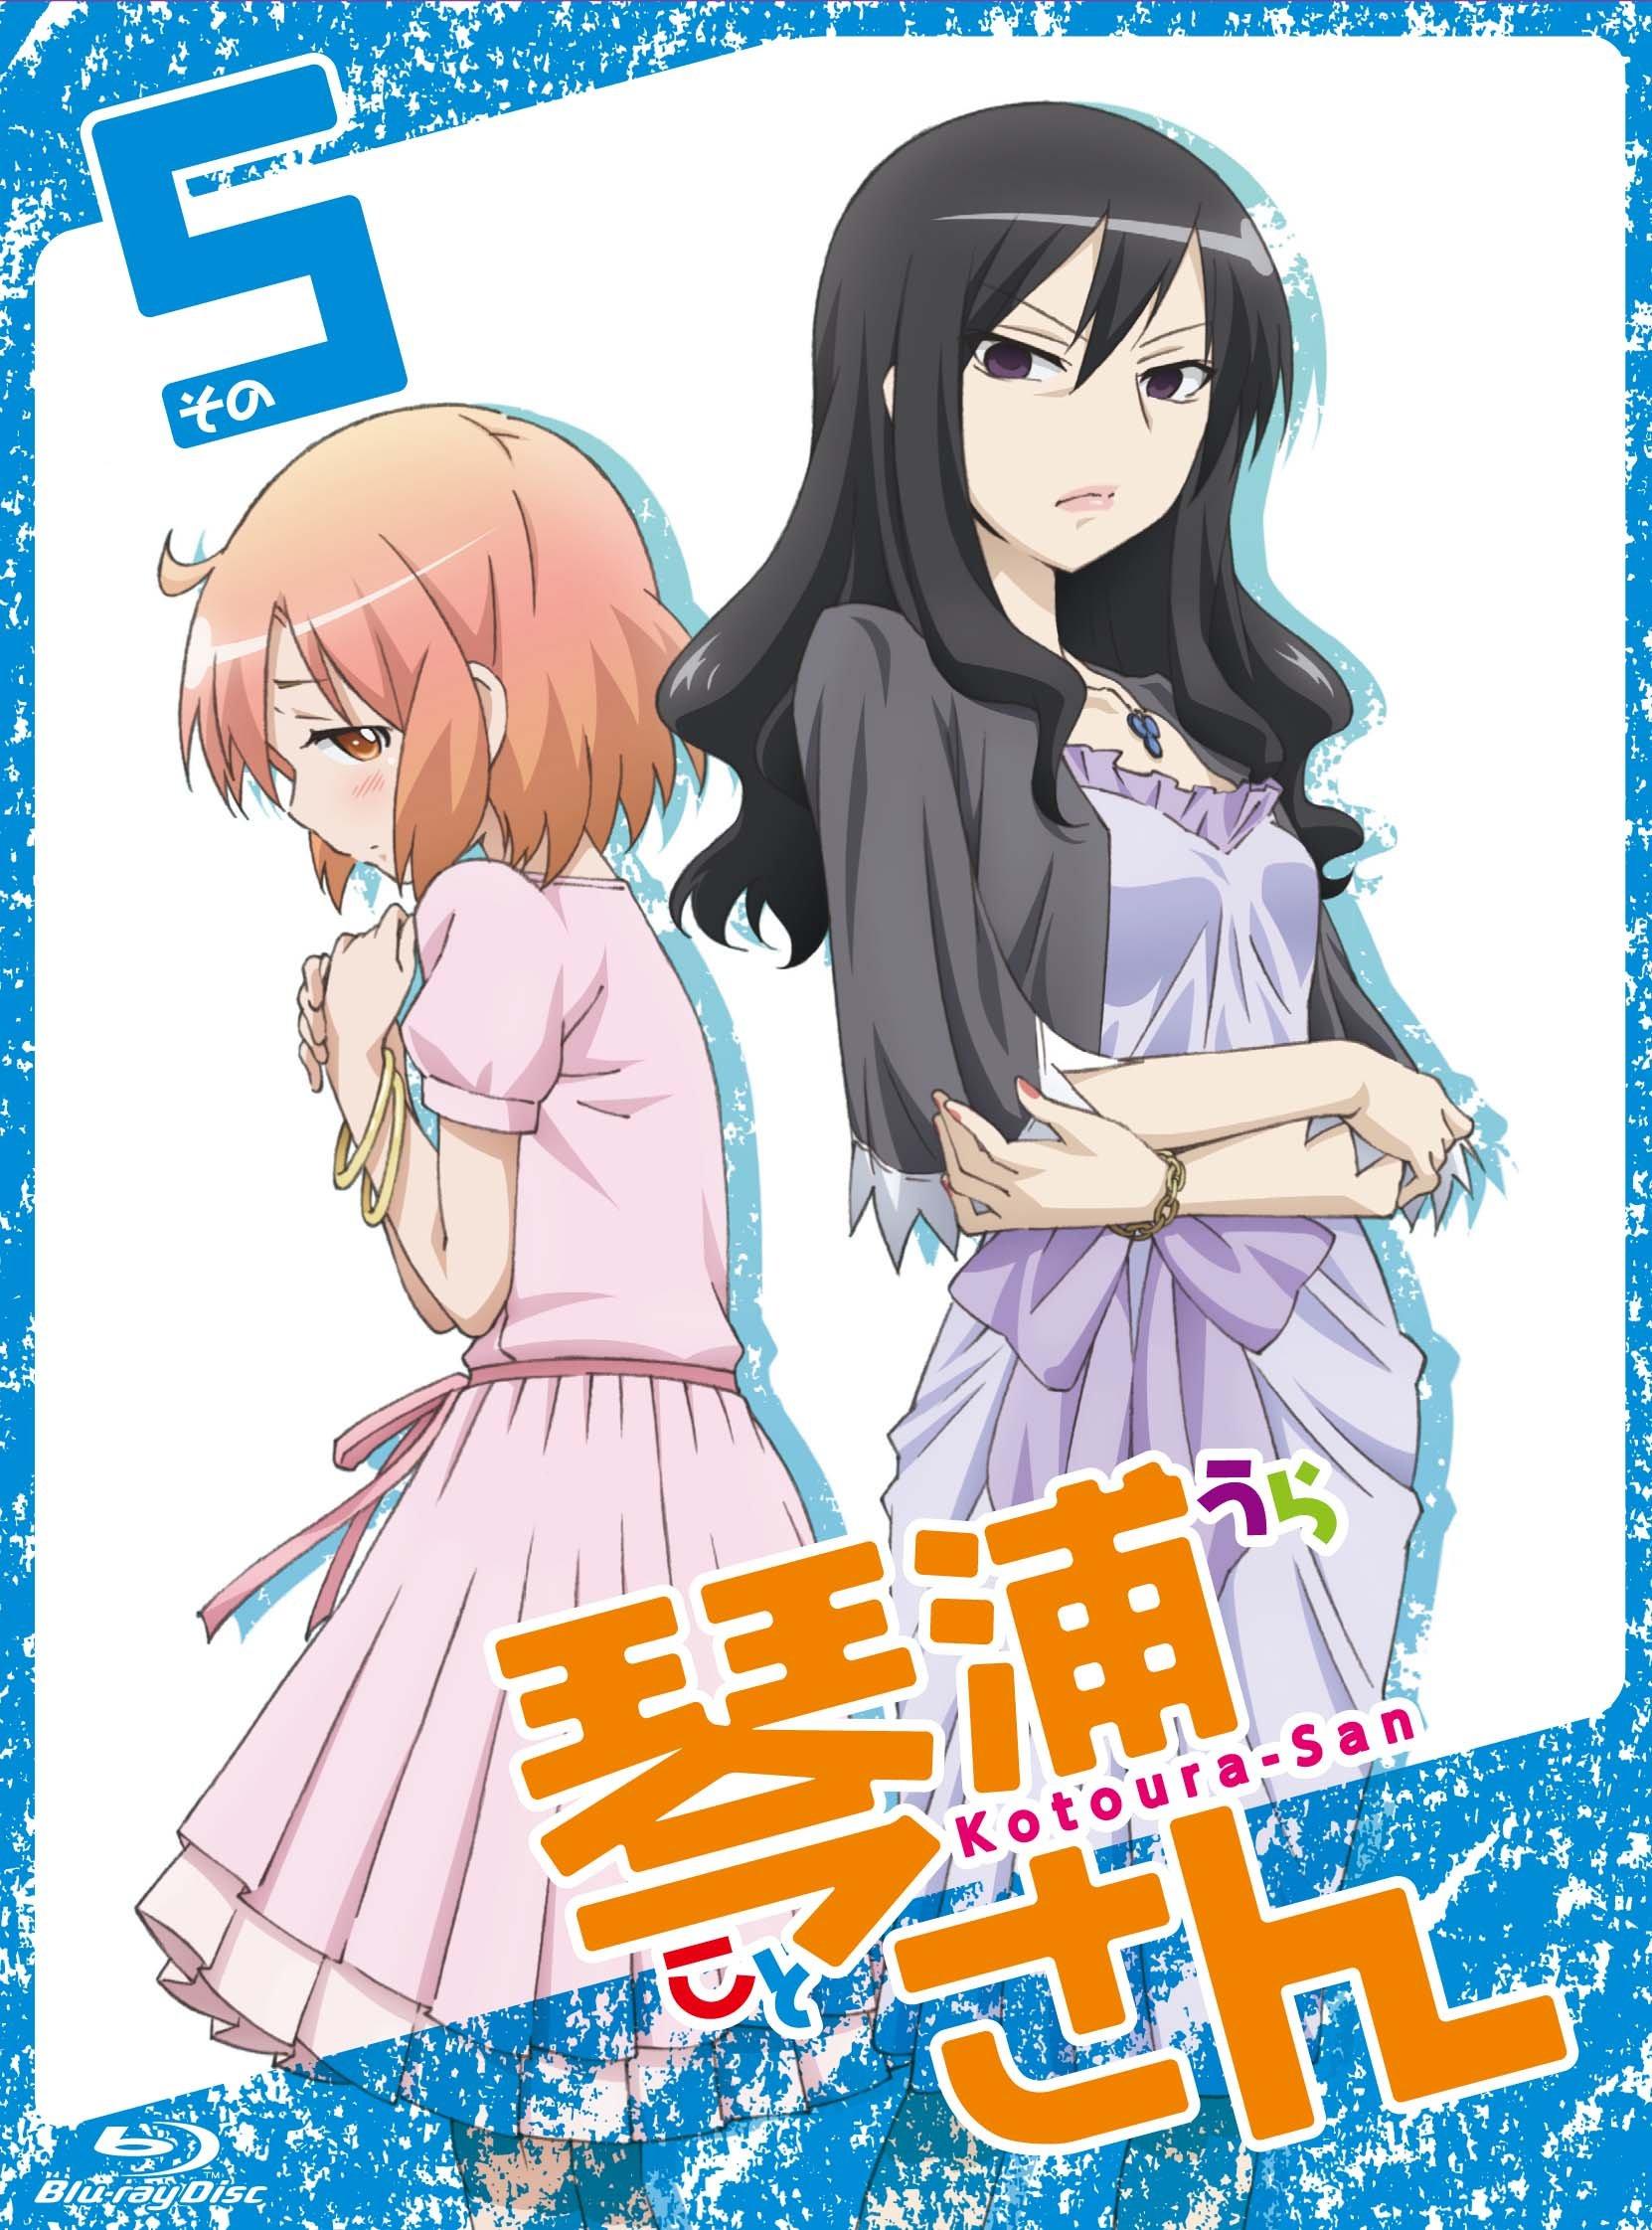 TV Animation Kotoura-San Vol.5 Special Edition - Anime by